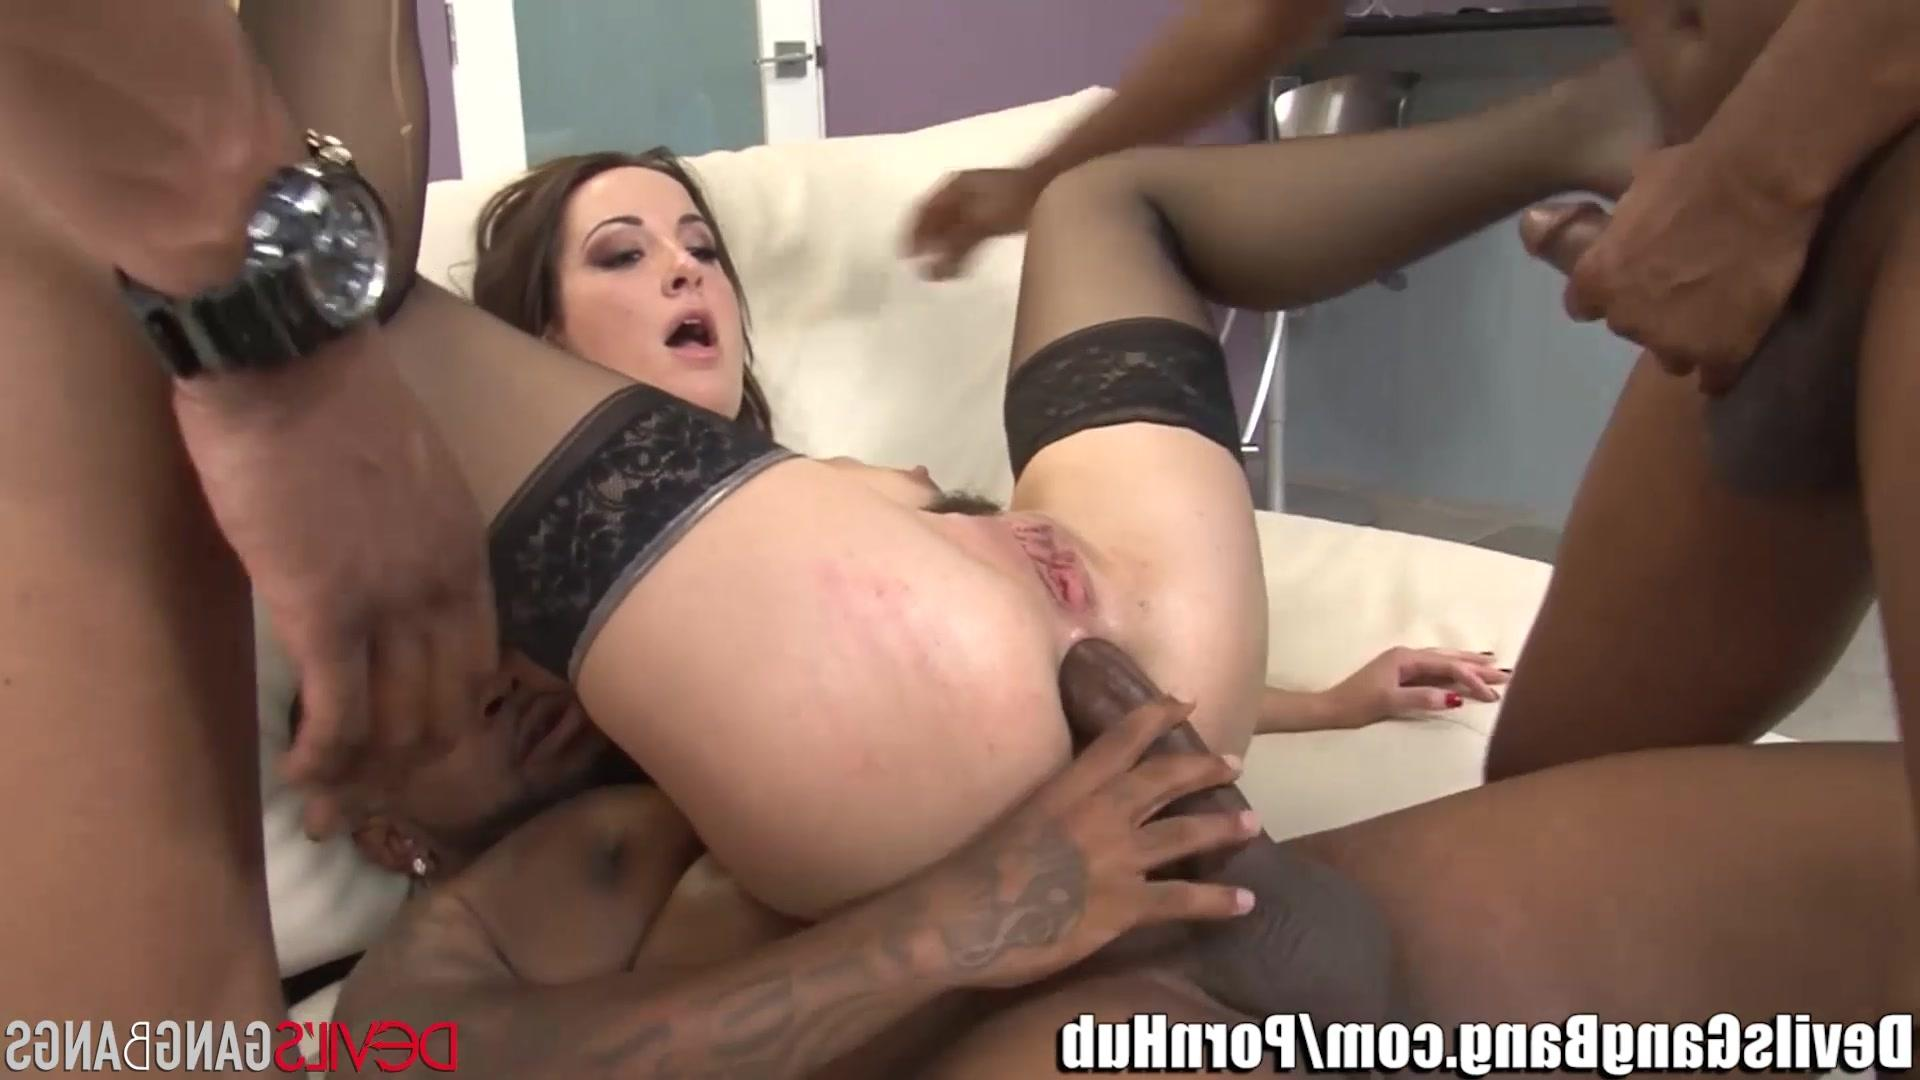 Порно видео жесткого секса hd